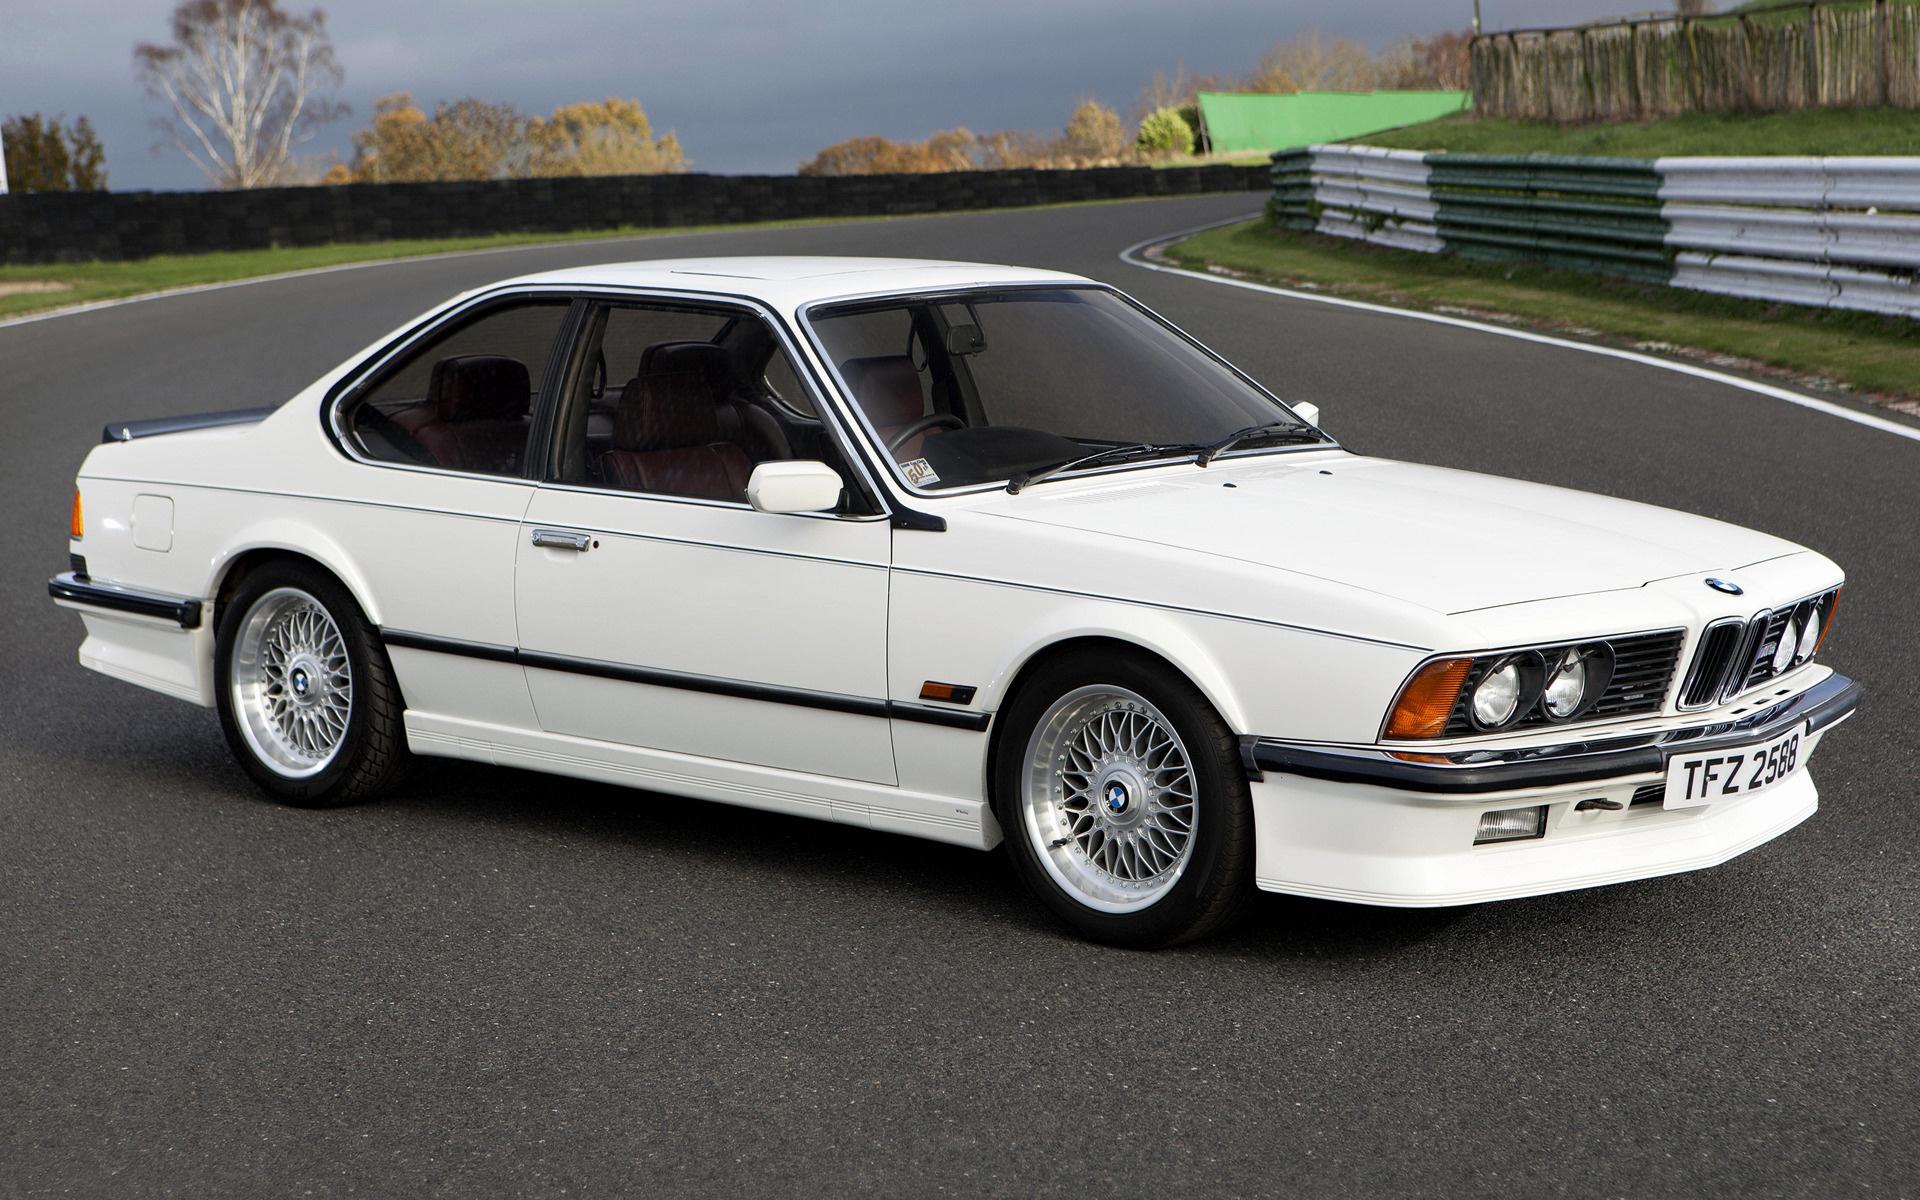 1984 Bmw M635 Csi Coupe Uk Fondos De Pantalla E Imágenes